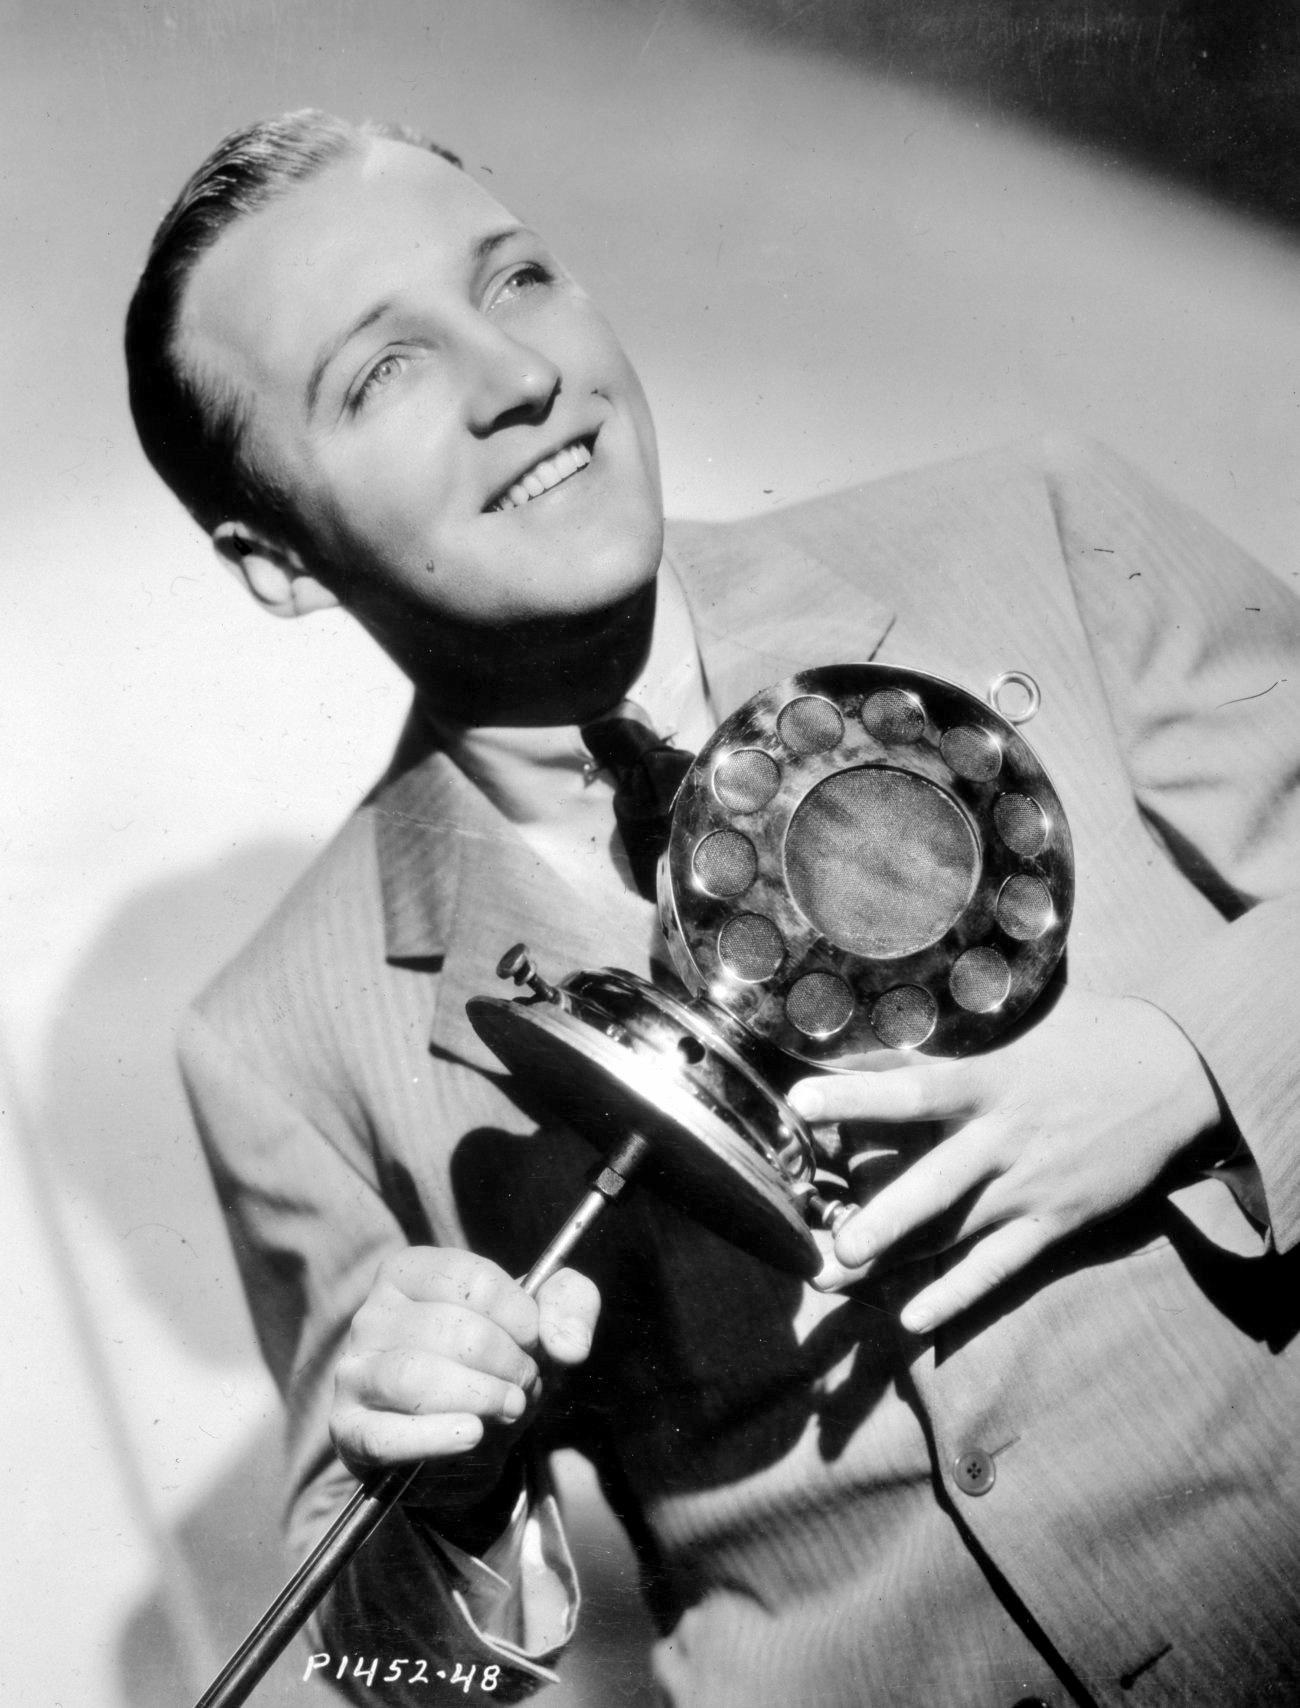 Bing Crosby (1926-1933)